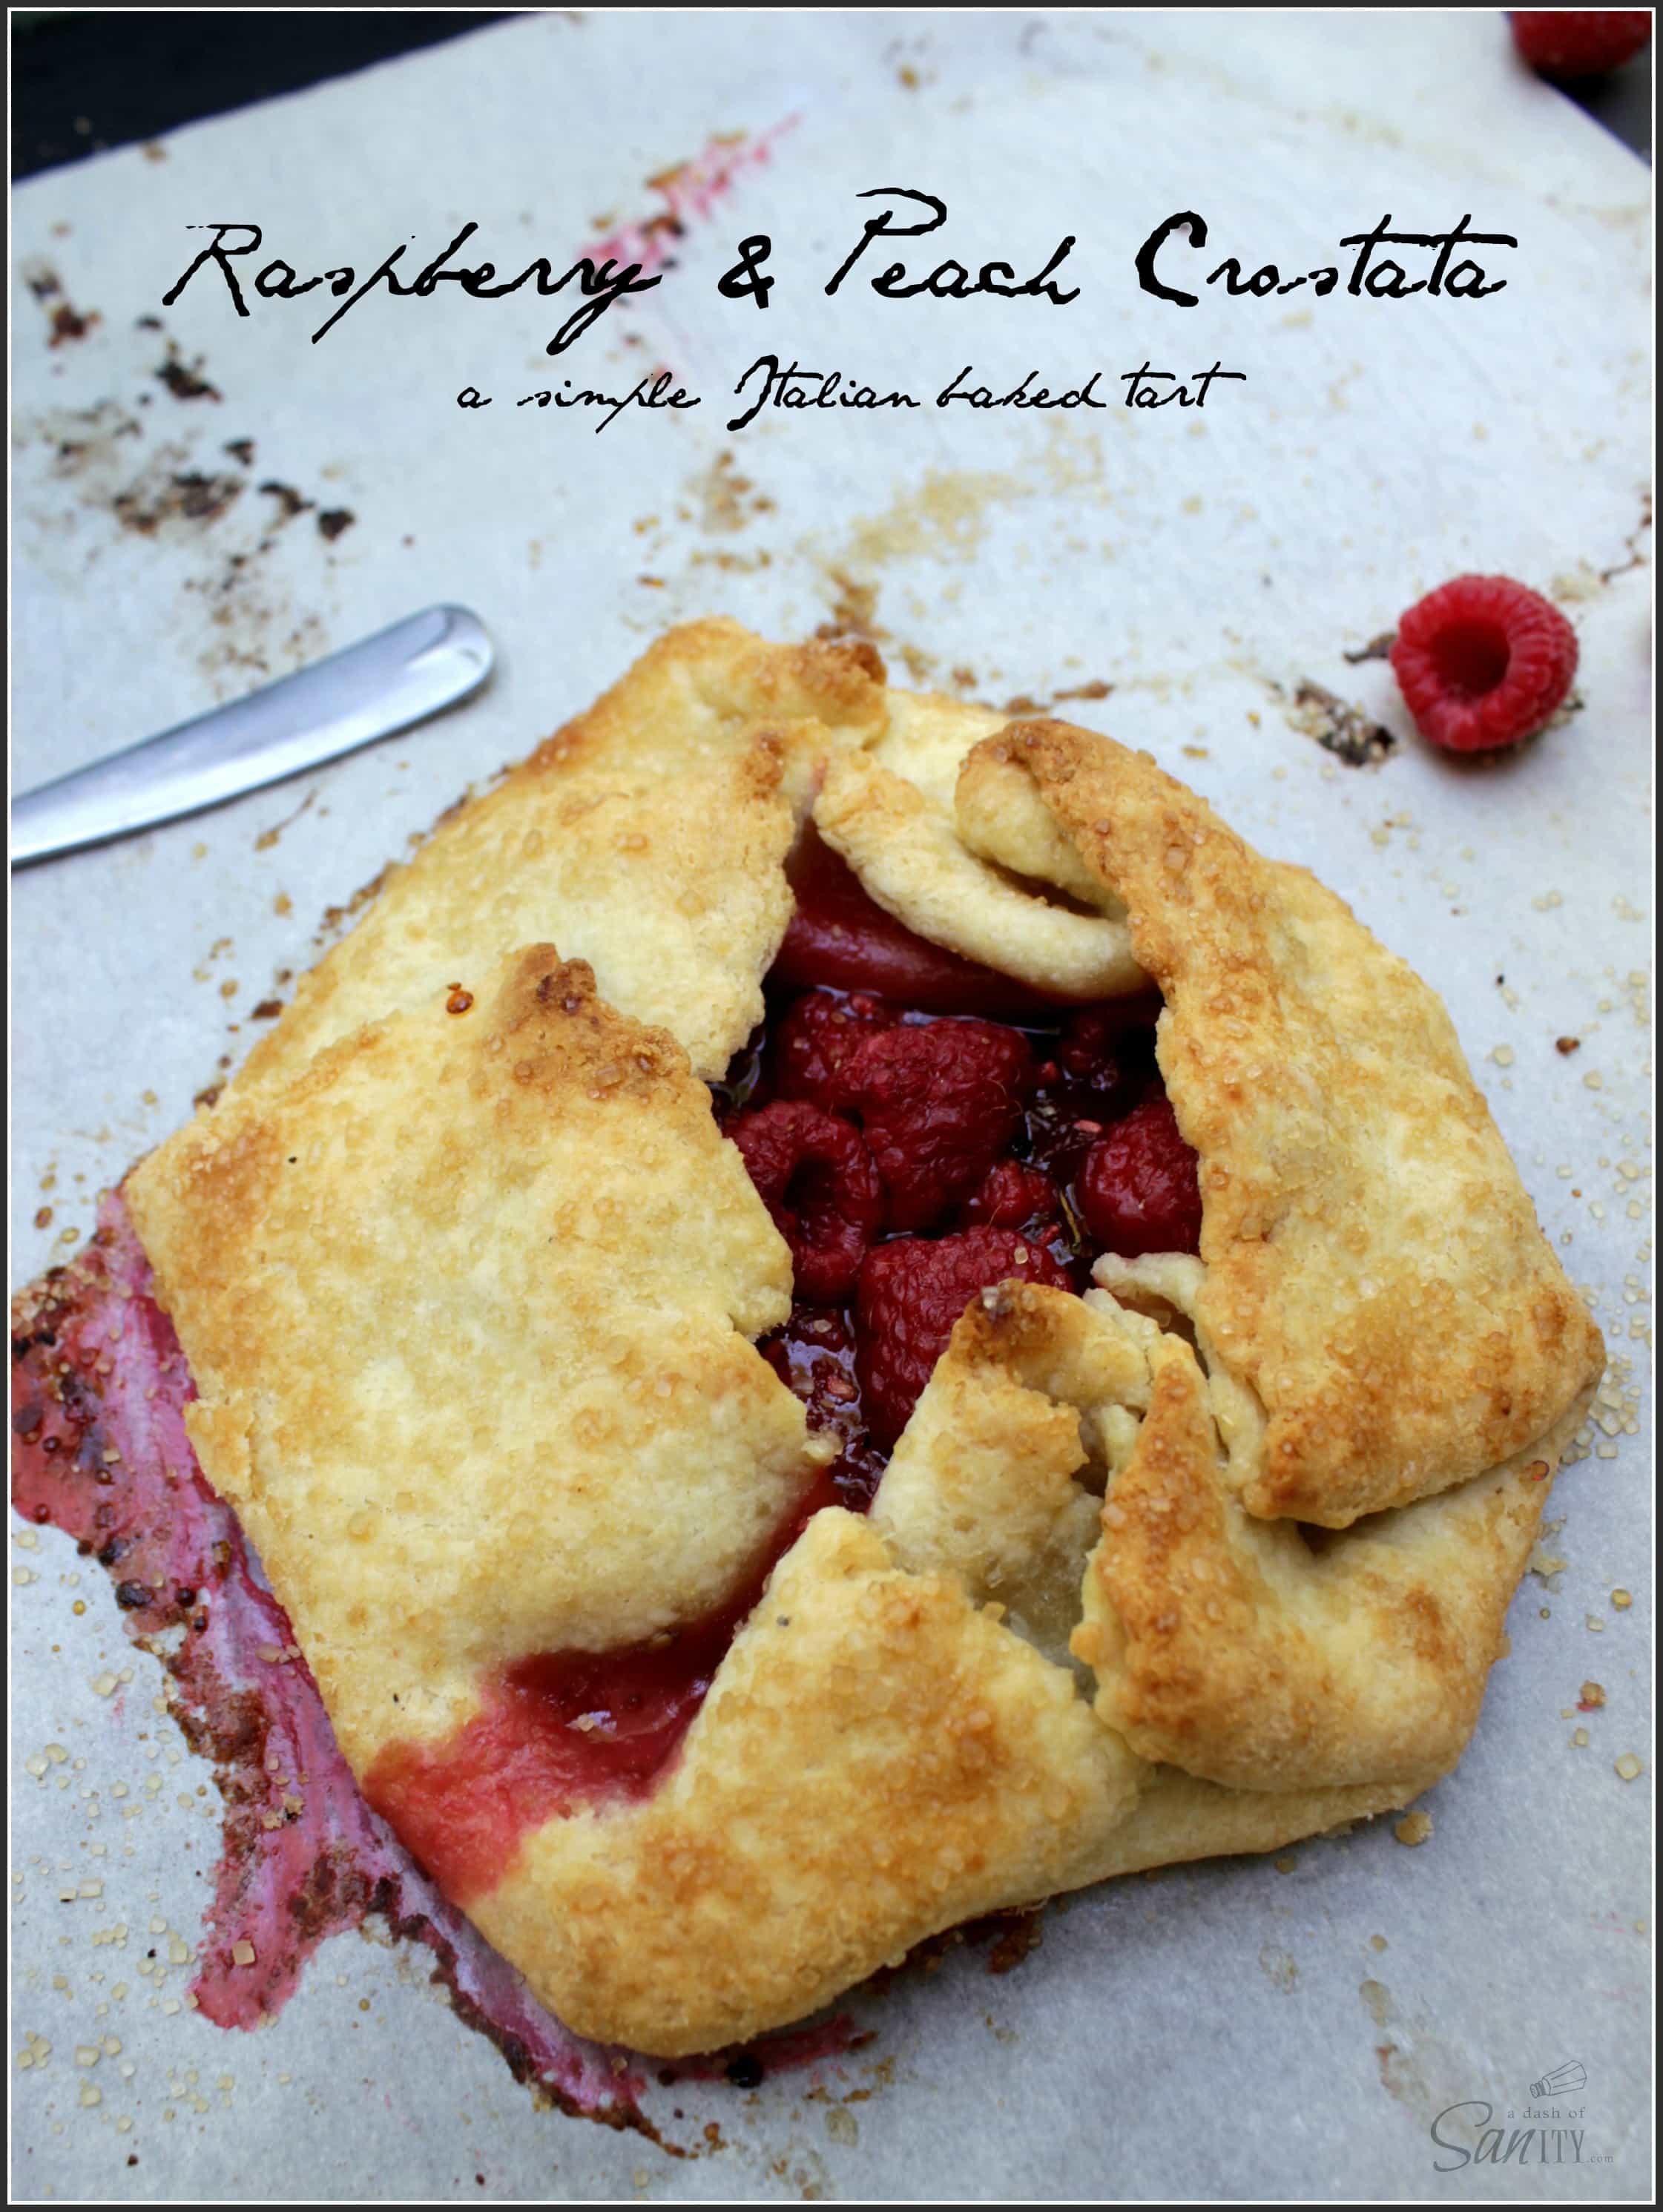 Raspberry & Peach Crostata | a simple Italian pastry